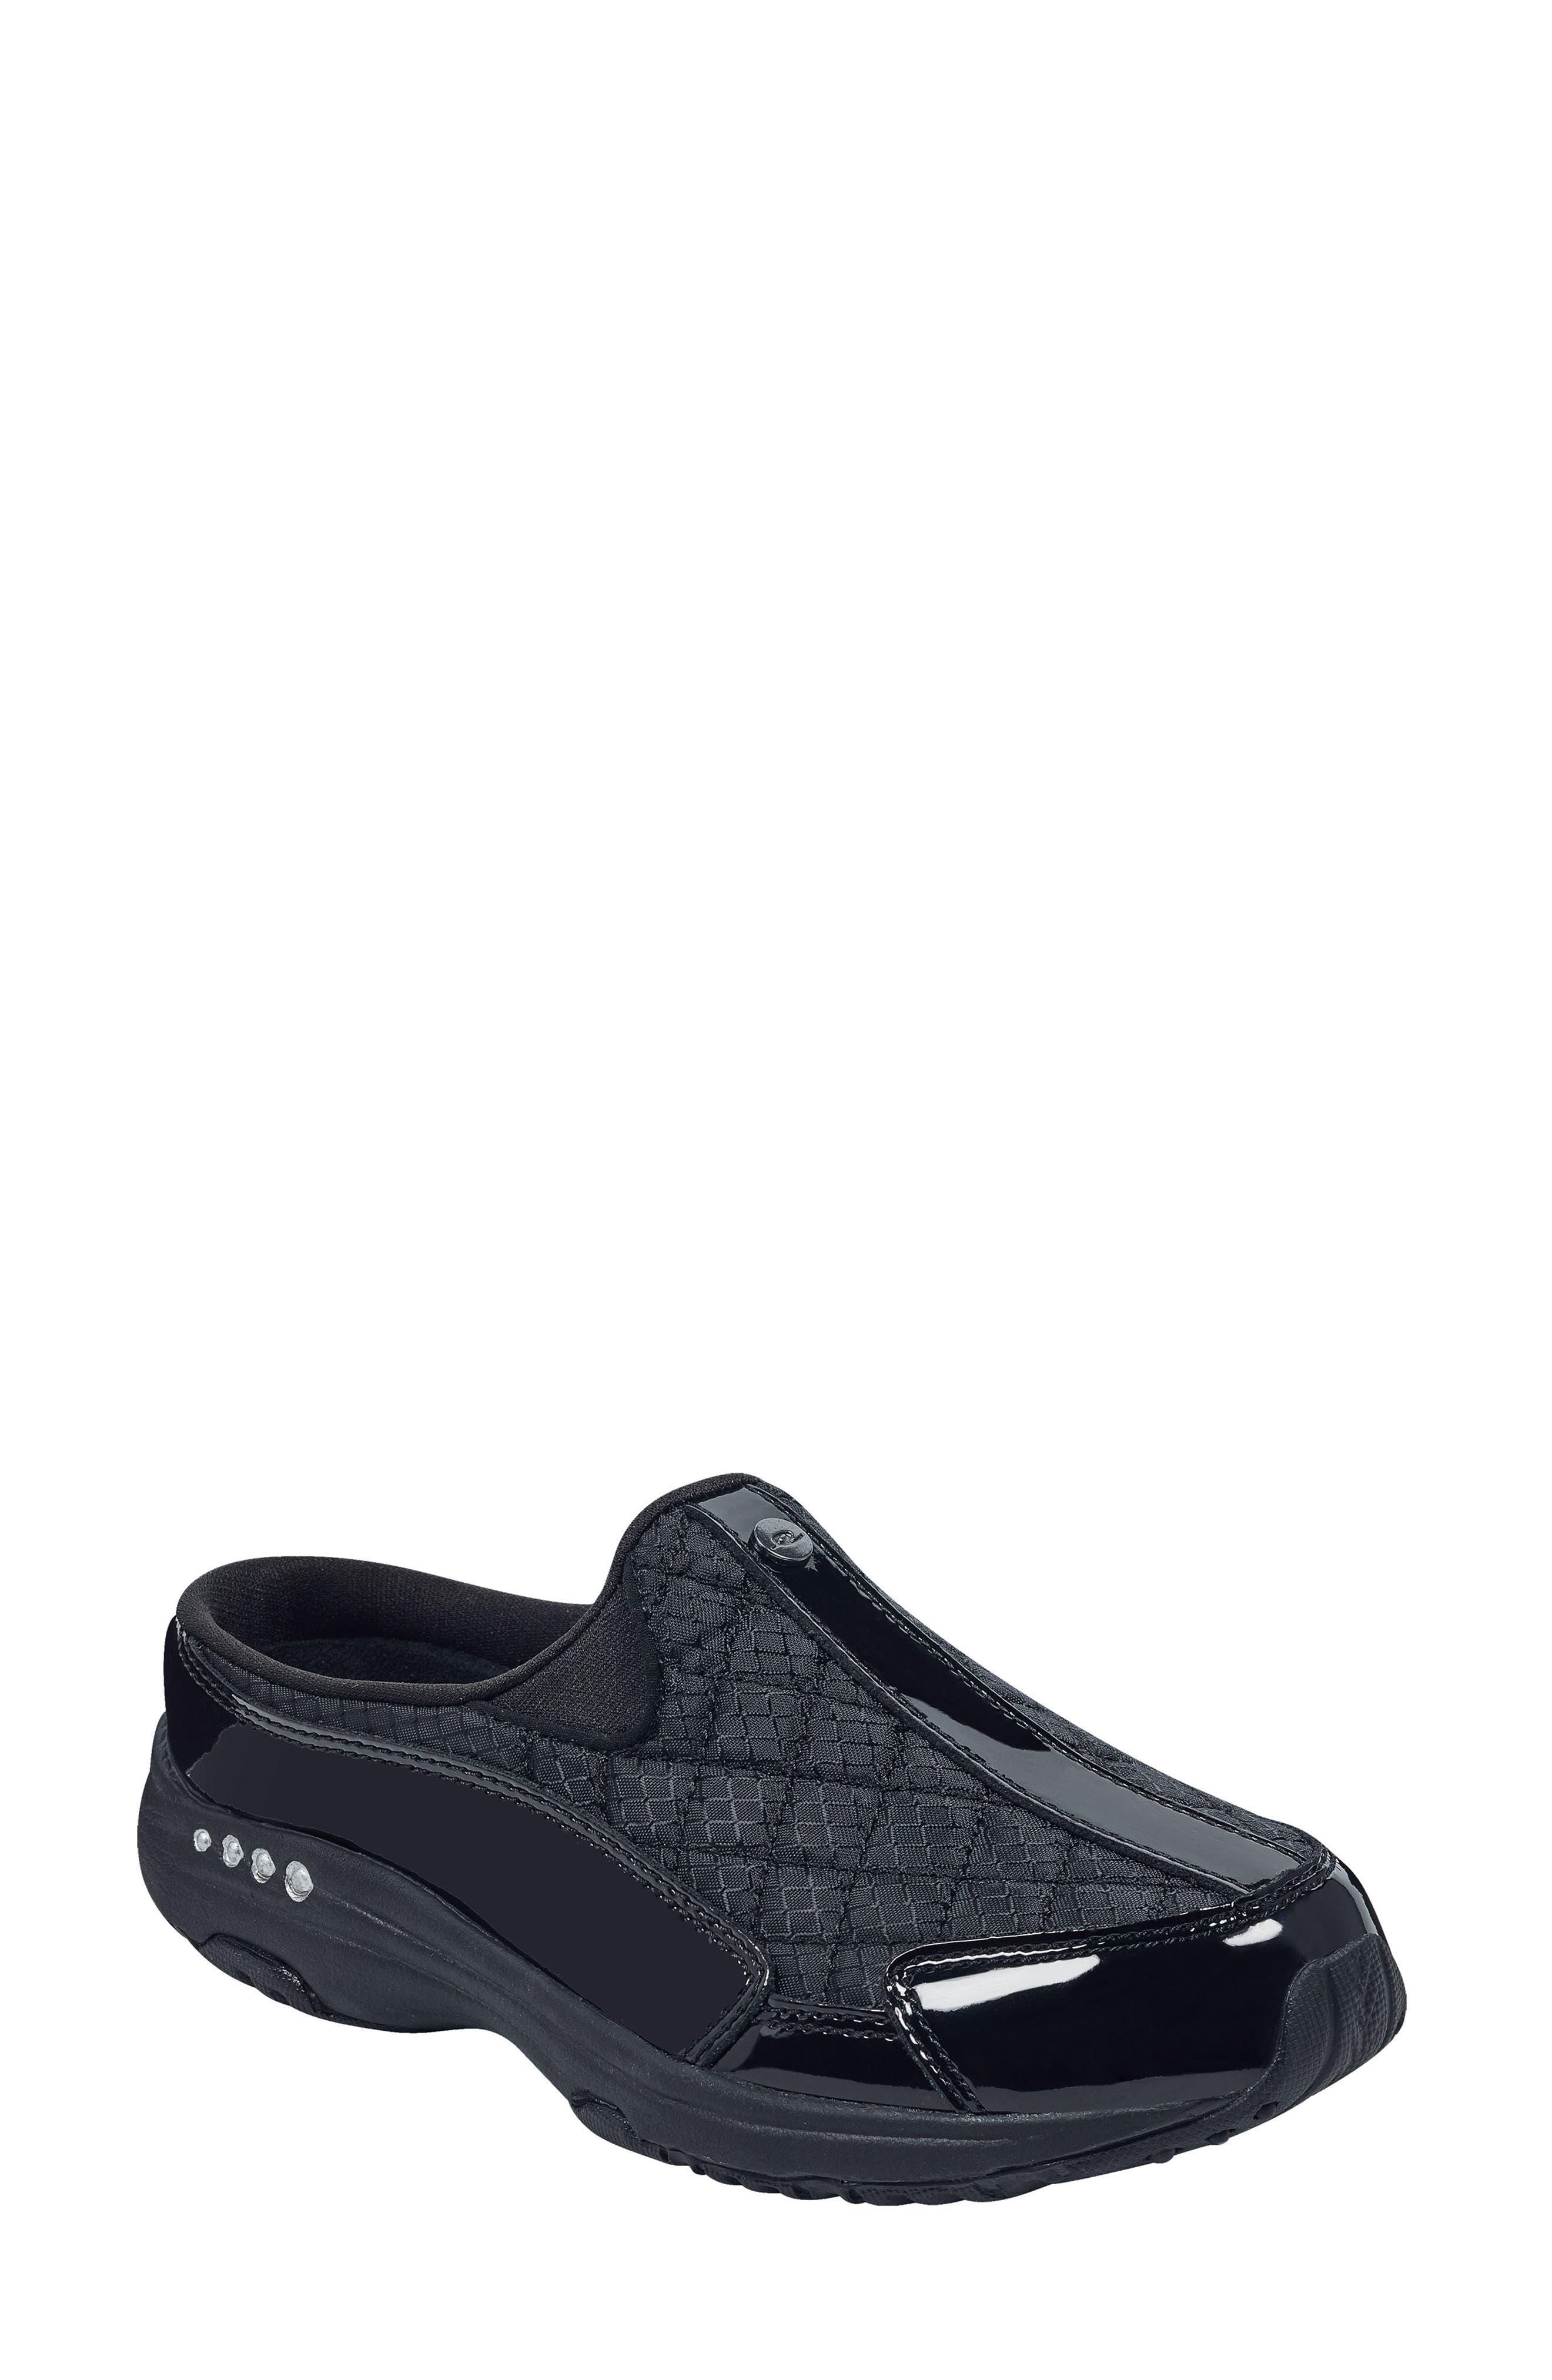 Women s Easy Spirit Traveltime Classic Clog Sneakers E568